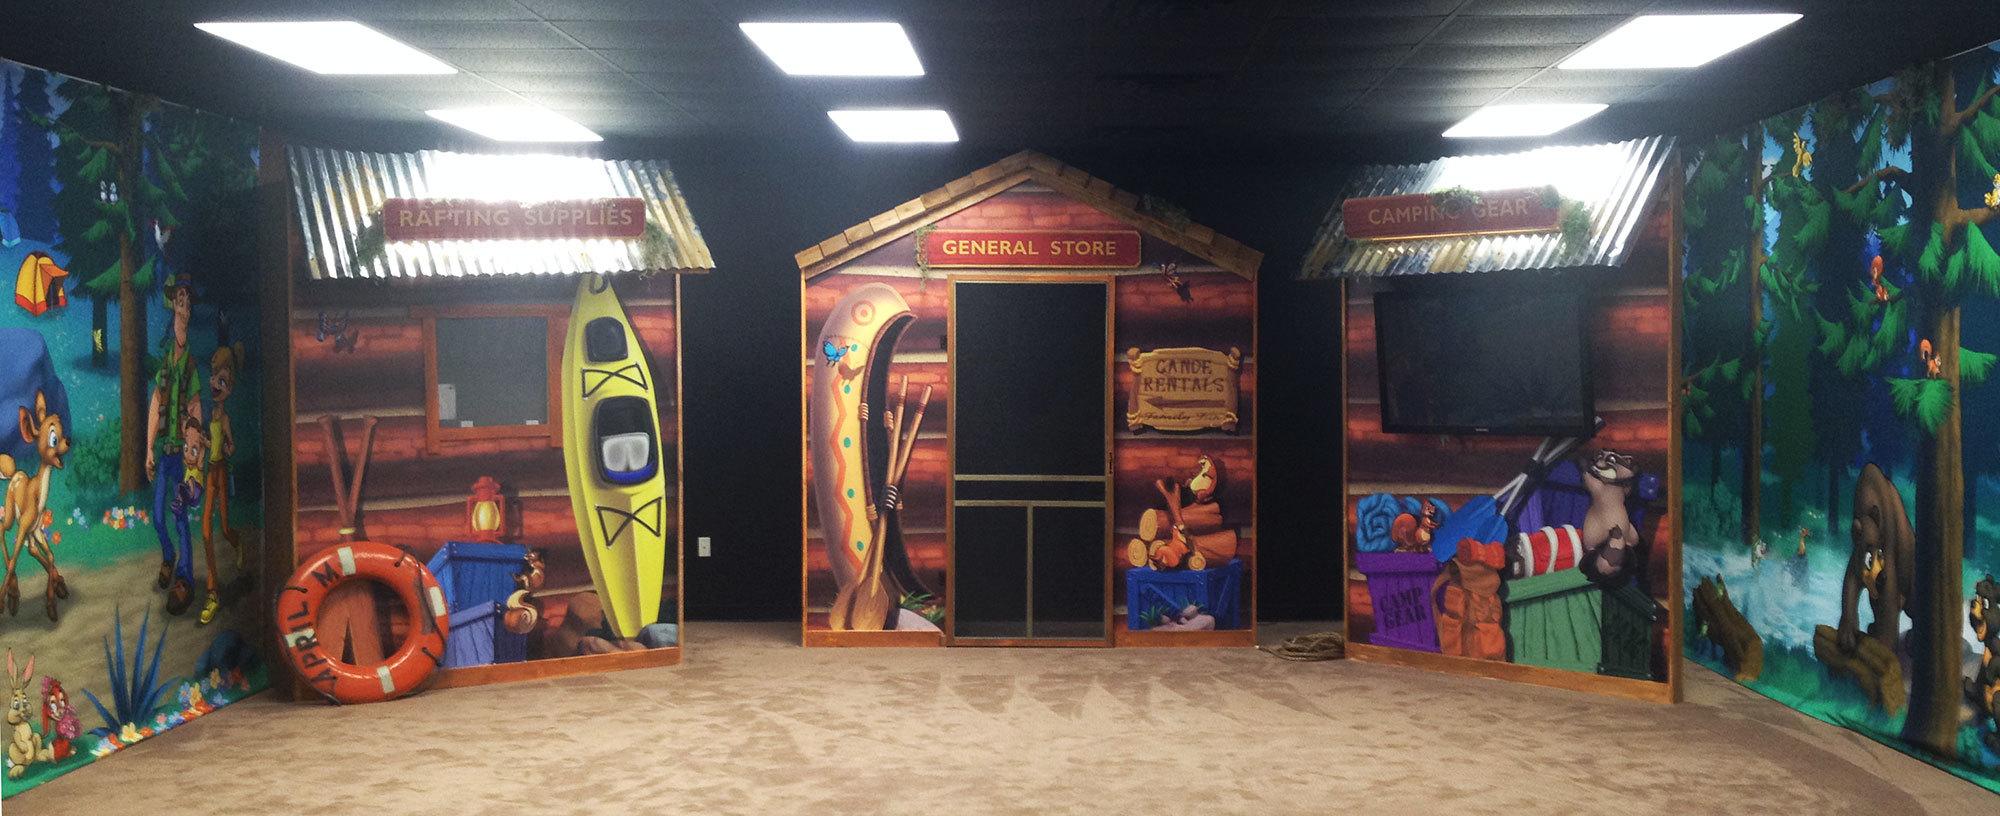 Camping and Lodge Themed Fascades at a Church